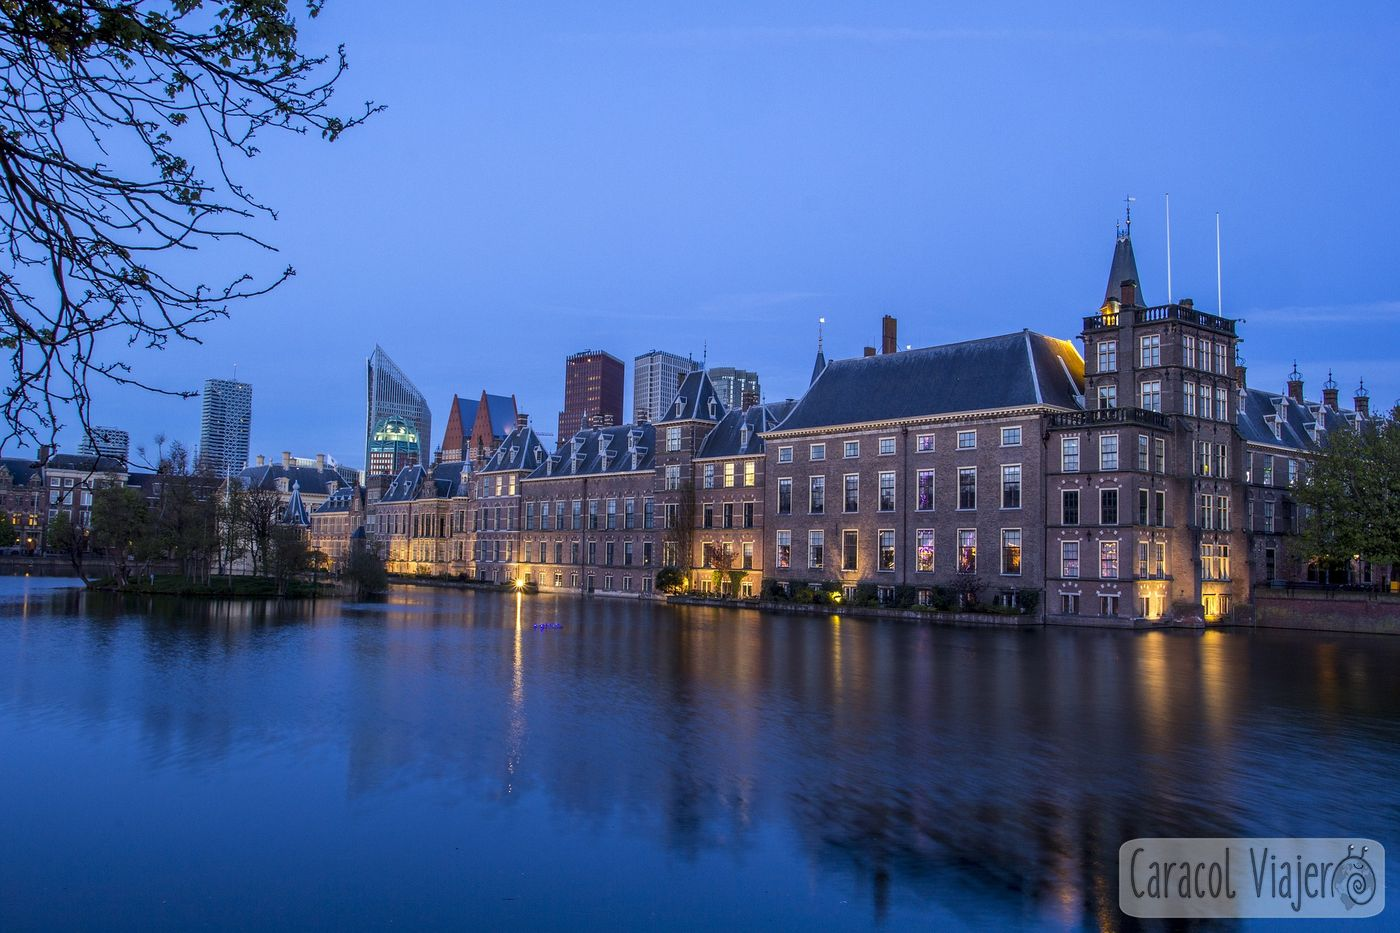 visitar Holanda en 4 días